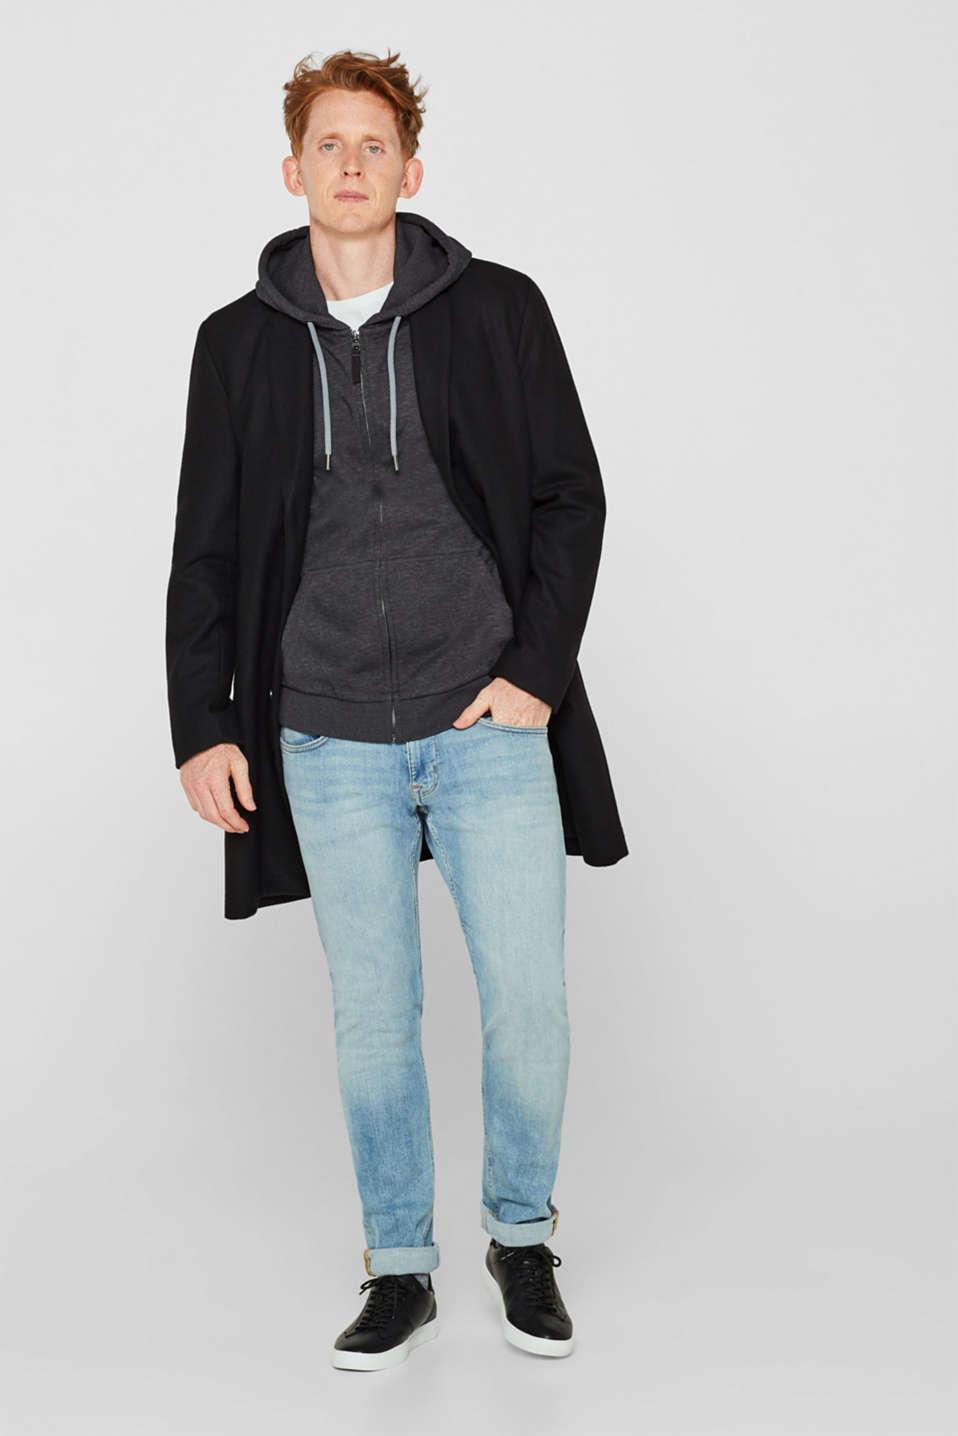 Hooded sweatshirt cardigan, ANTHRACITE, detail image number 1